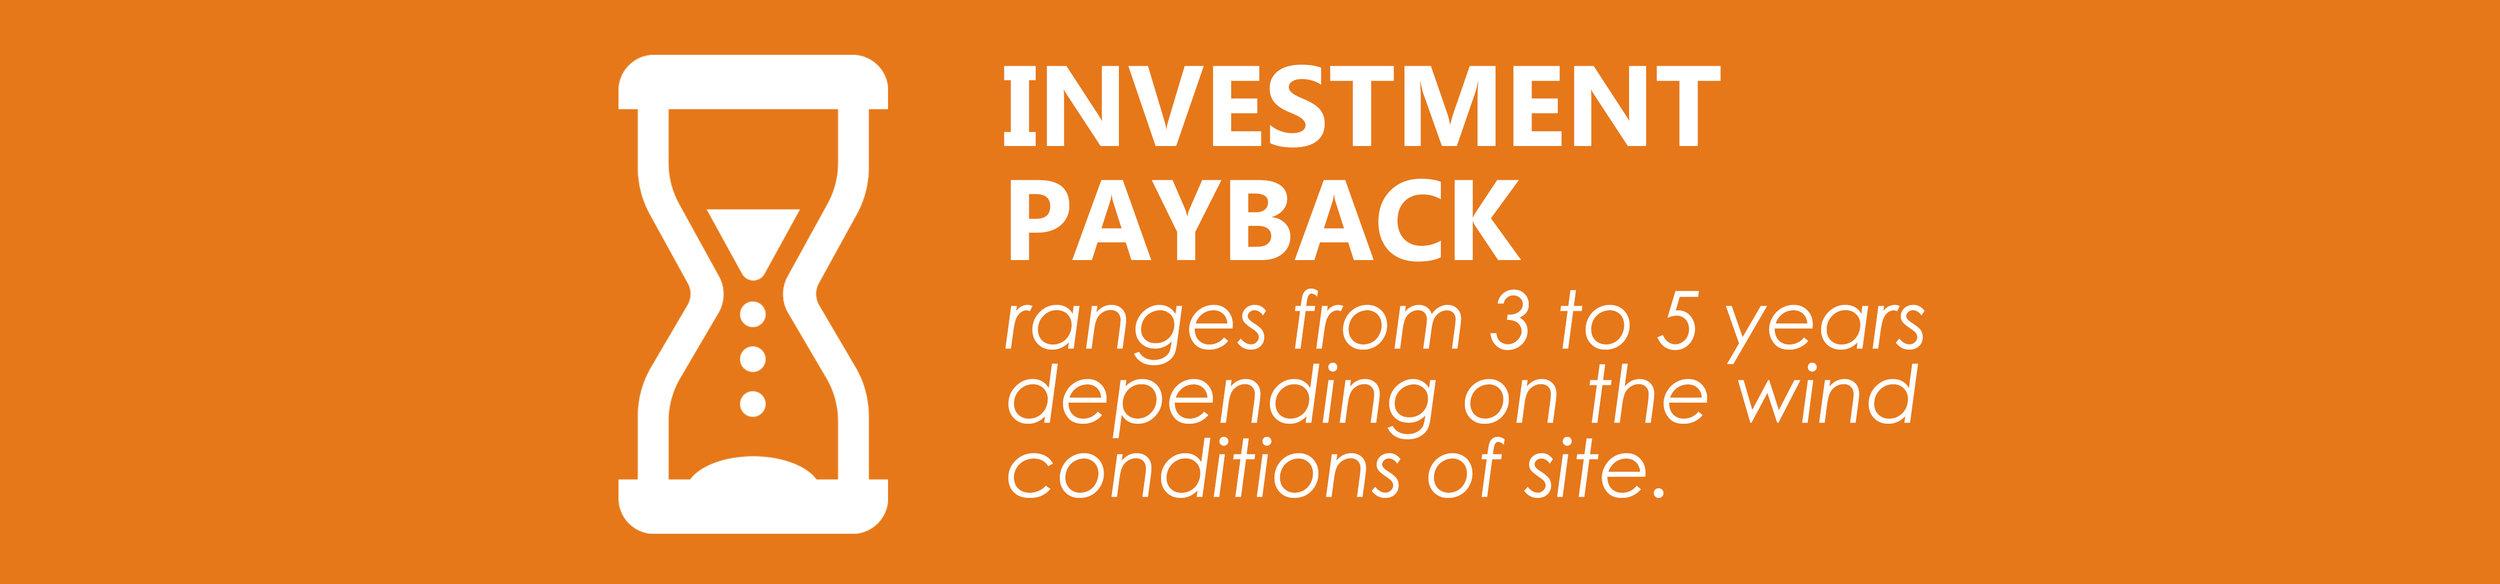 2018-07-30_investmentpayback (2).jpg